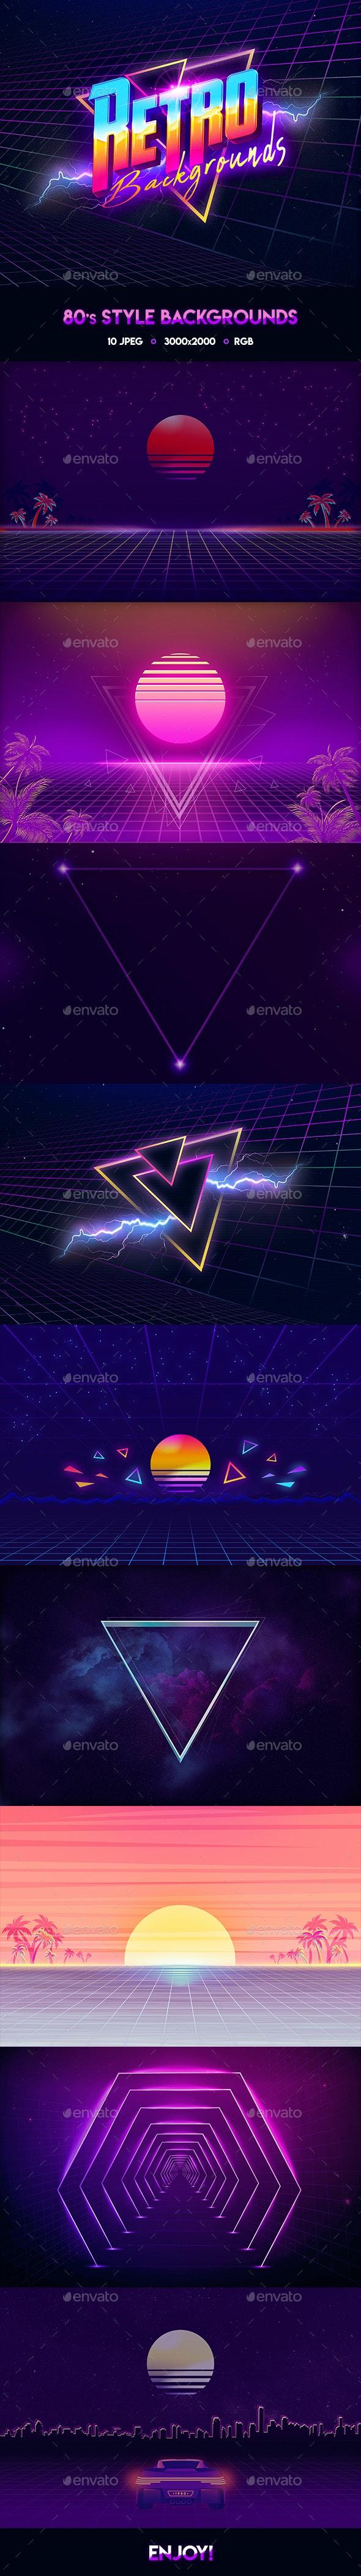 80s Retro Backgrounds 2 - Tech / Futuristic Backgrounds